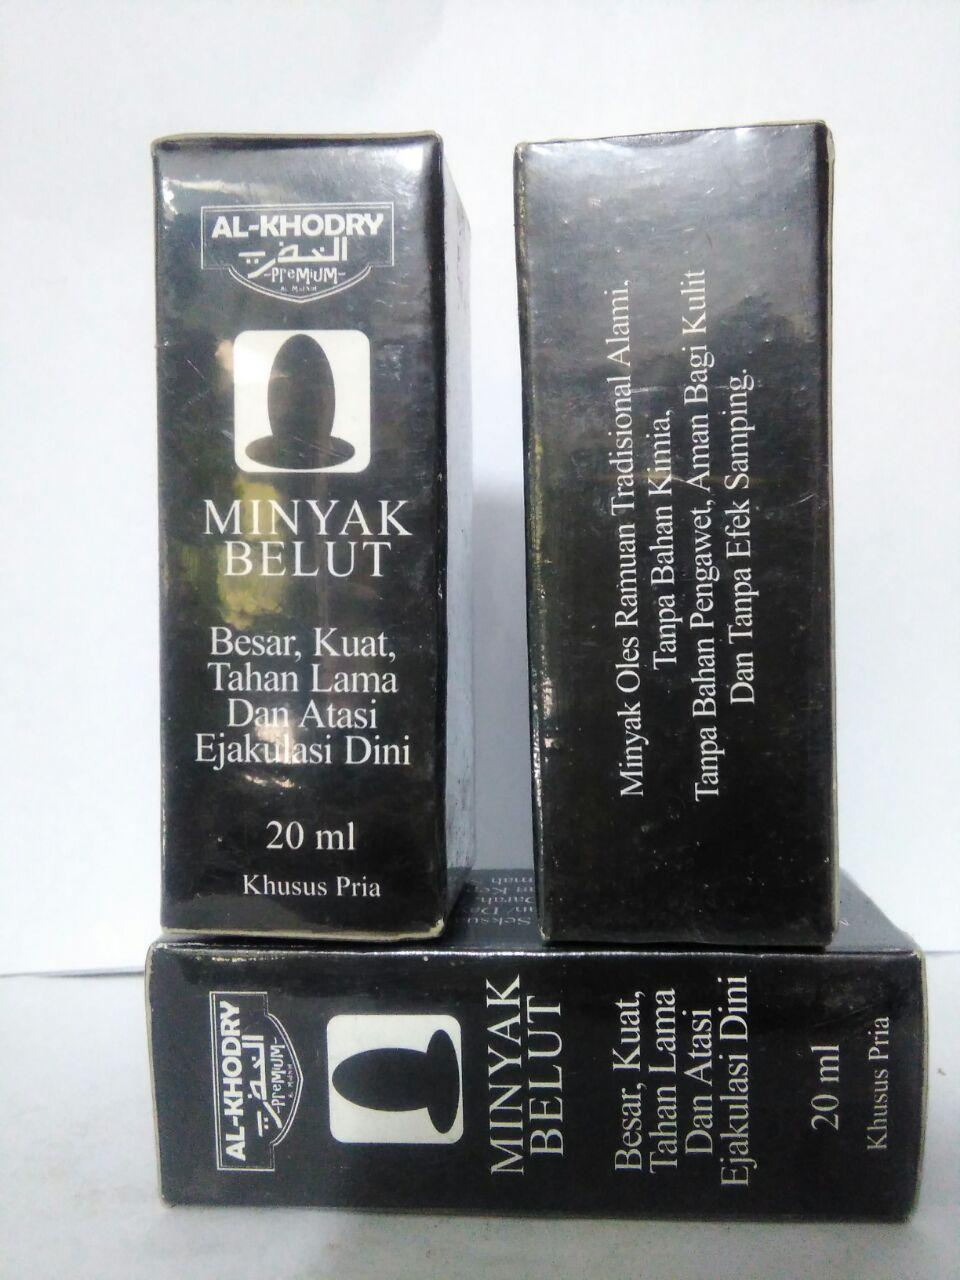 MINYAK BELUT ( Original ) - 20 ml AL KHODRY Minyak ramuan tradisional tanpa bahan kimia